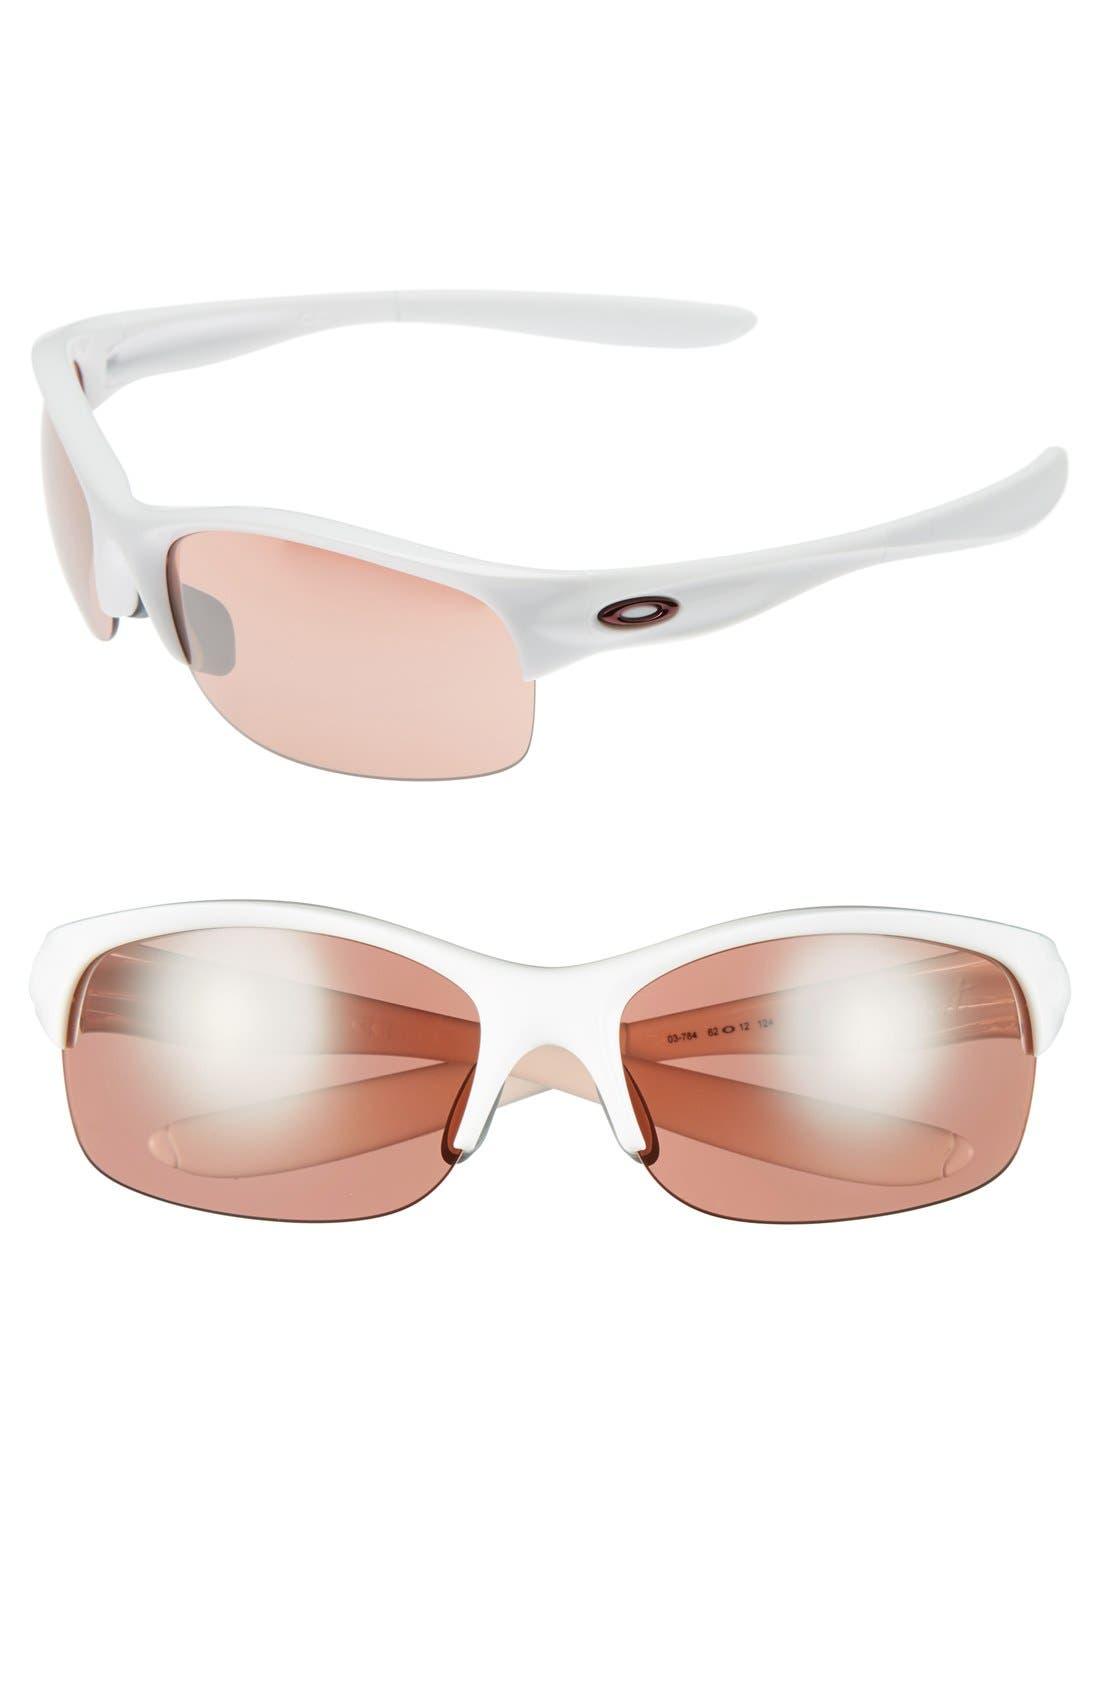 Main Image - Oakley 'Commit' 62mm Sunglasses